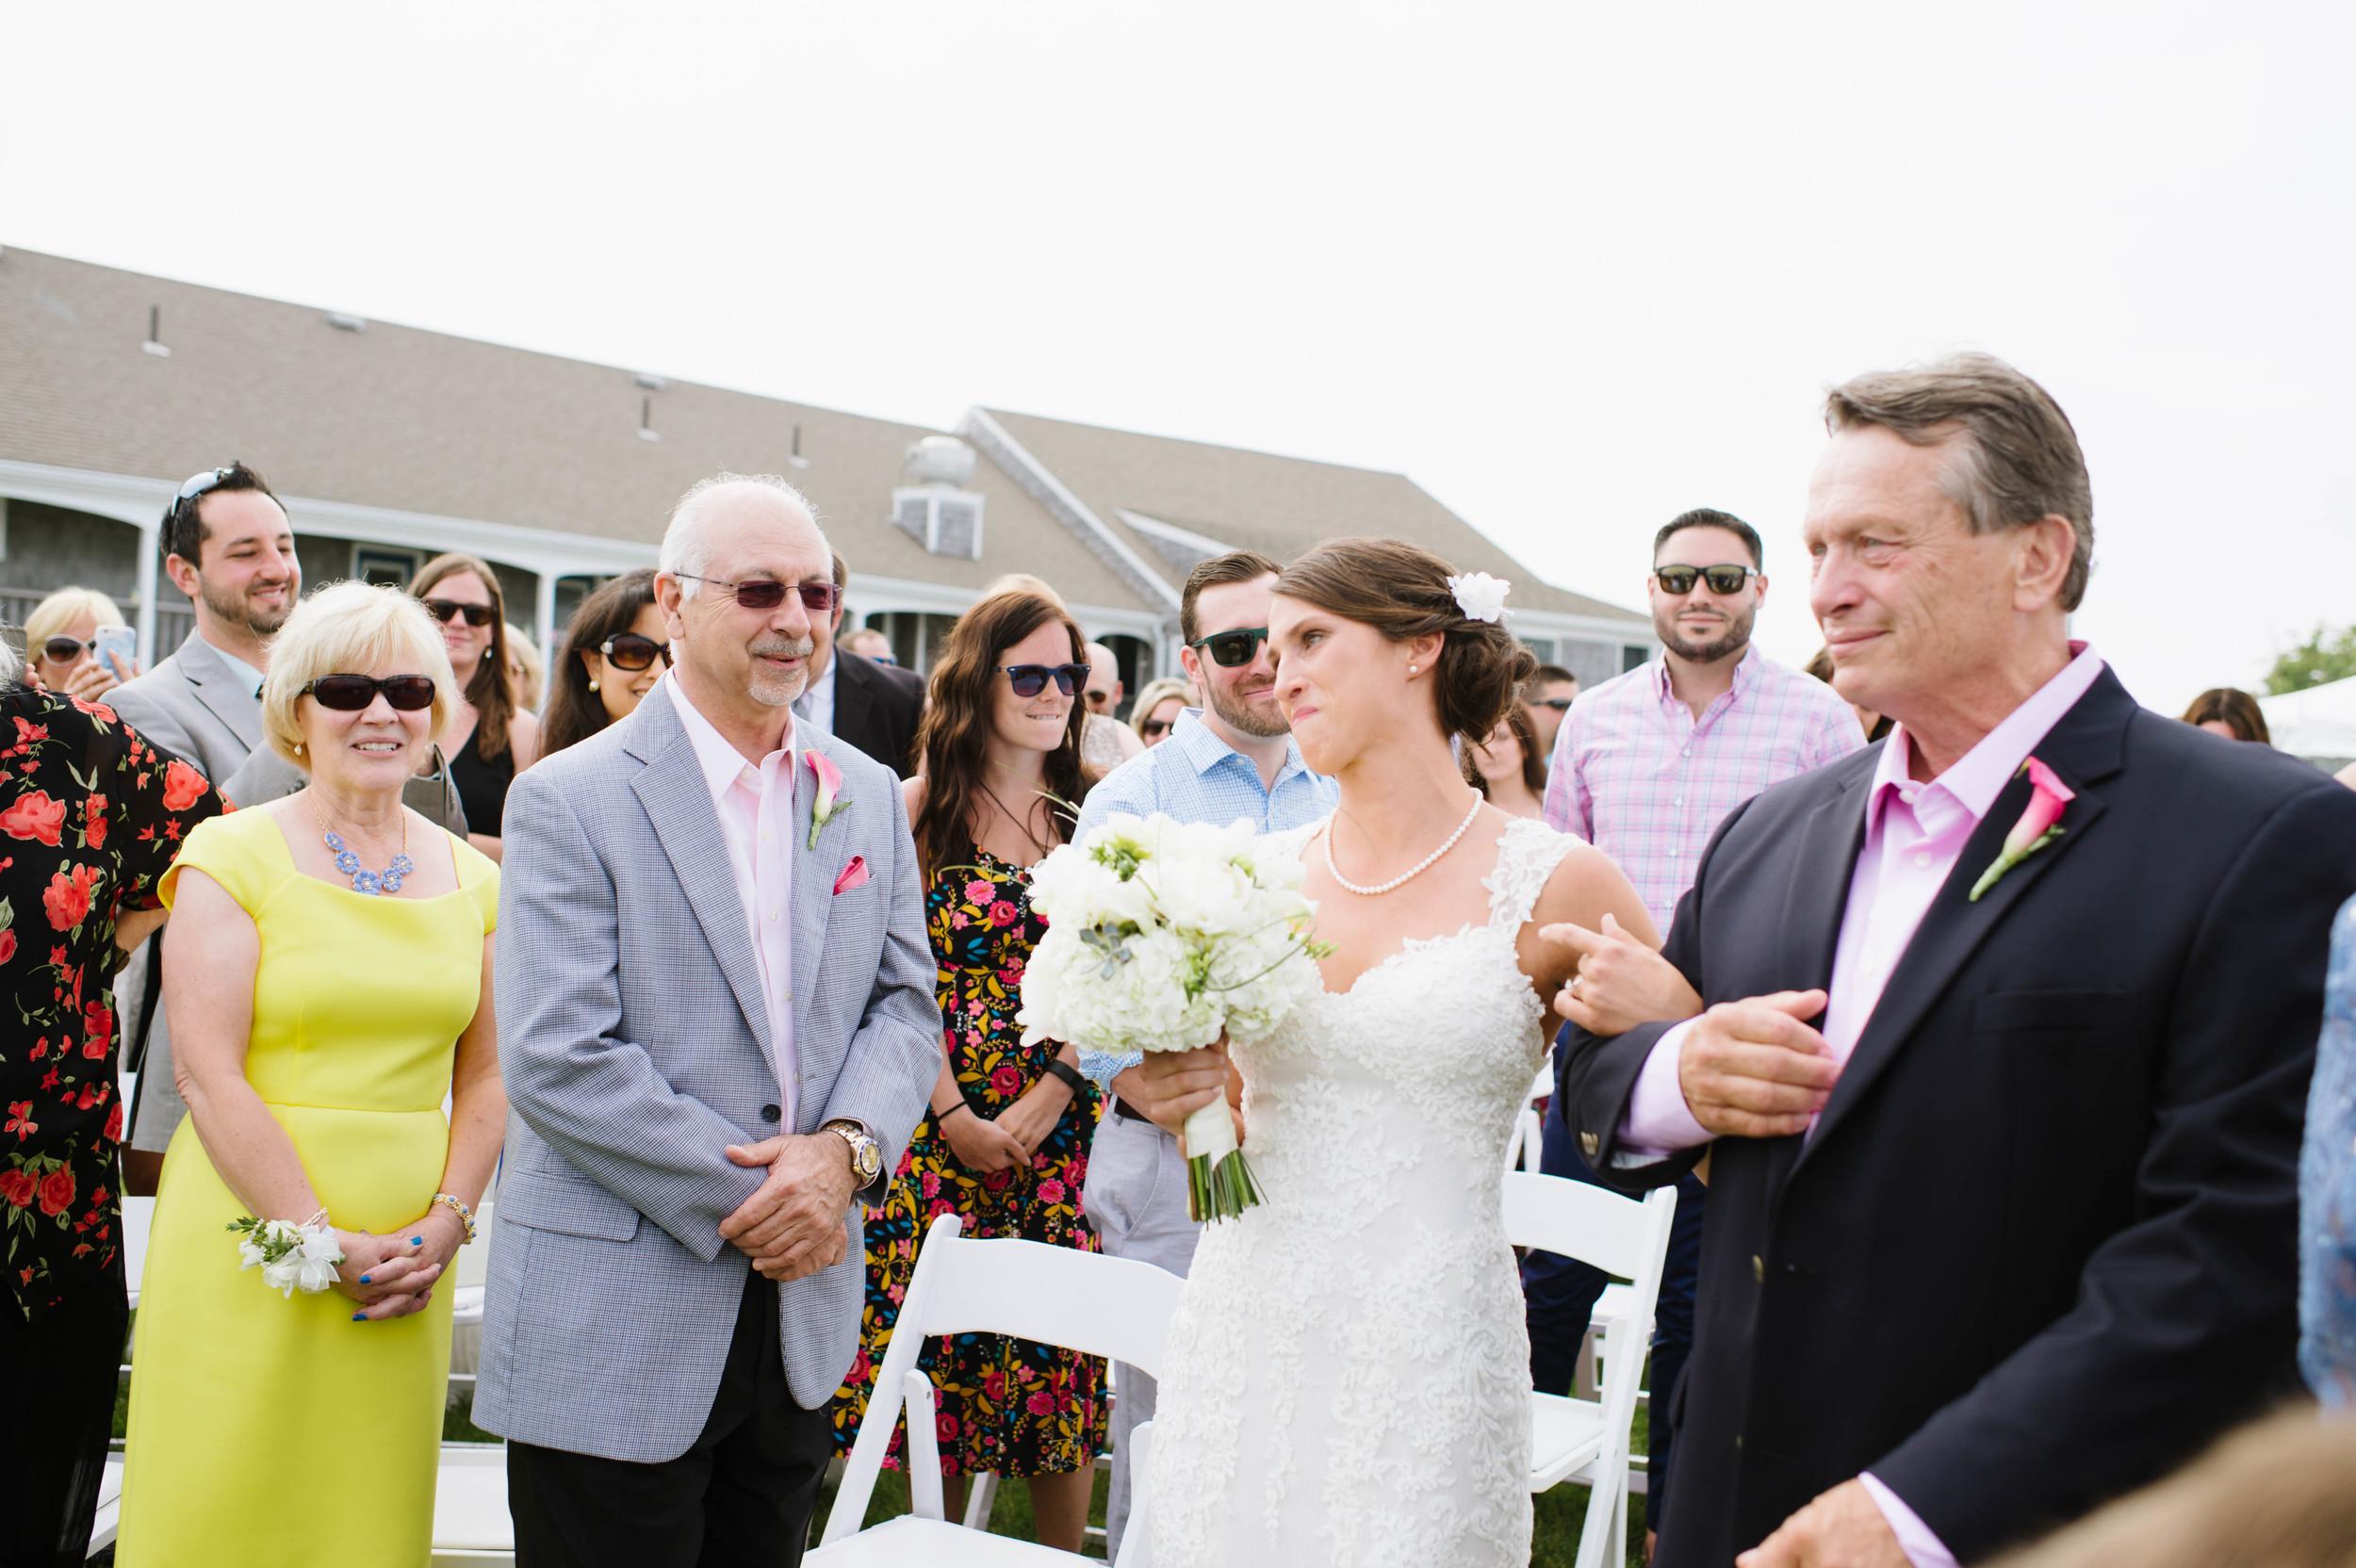 Pelham_House_Wedding_Cape_Cod007.jpg